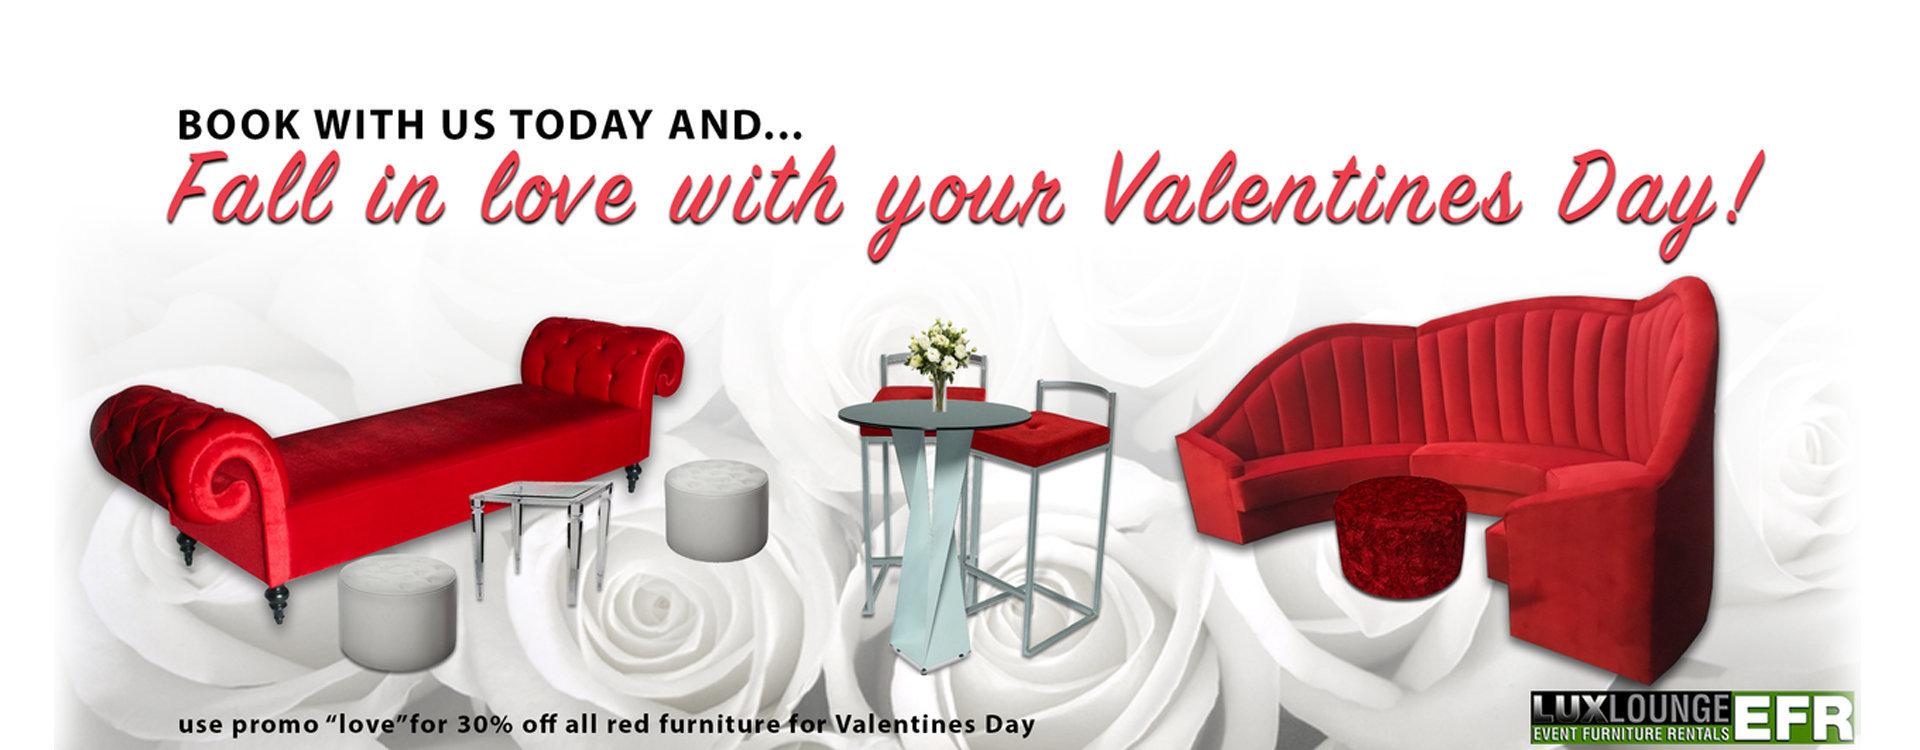 valentines-day1-img